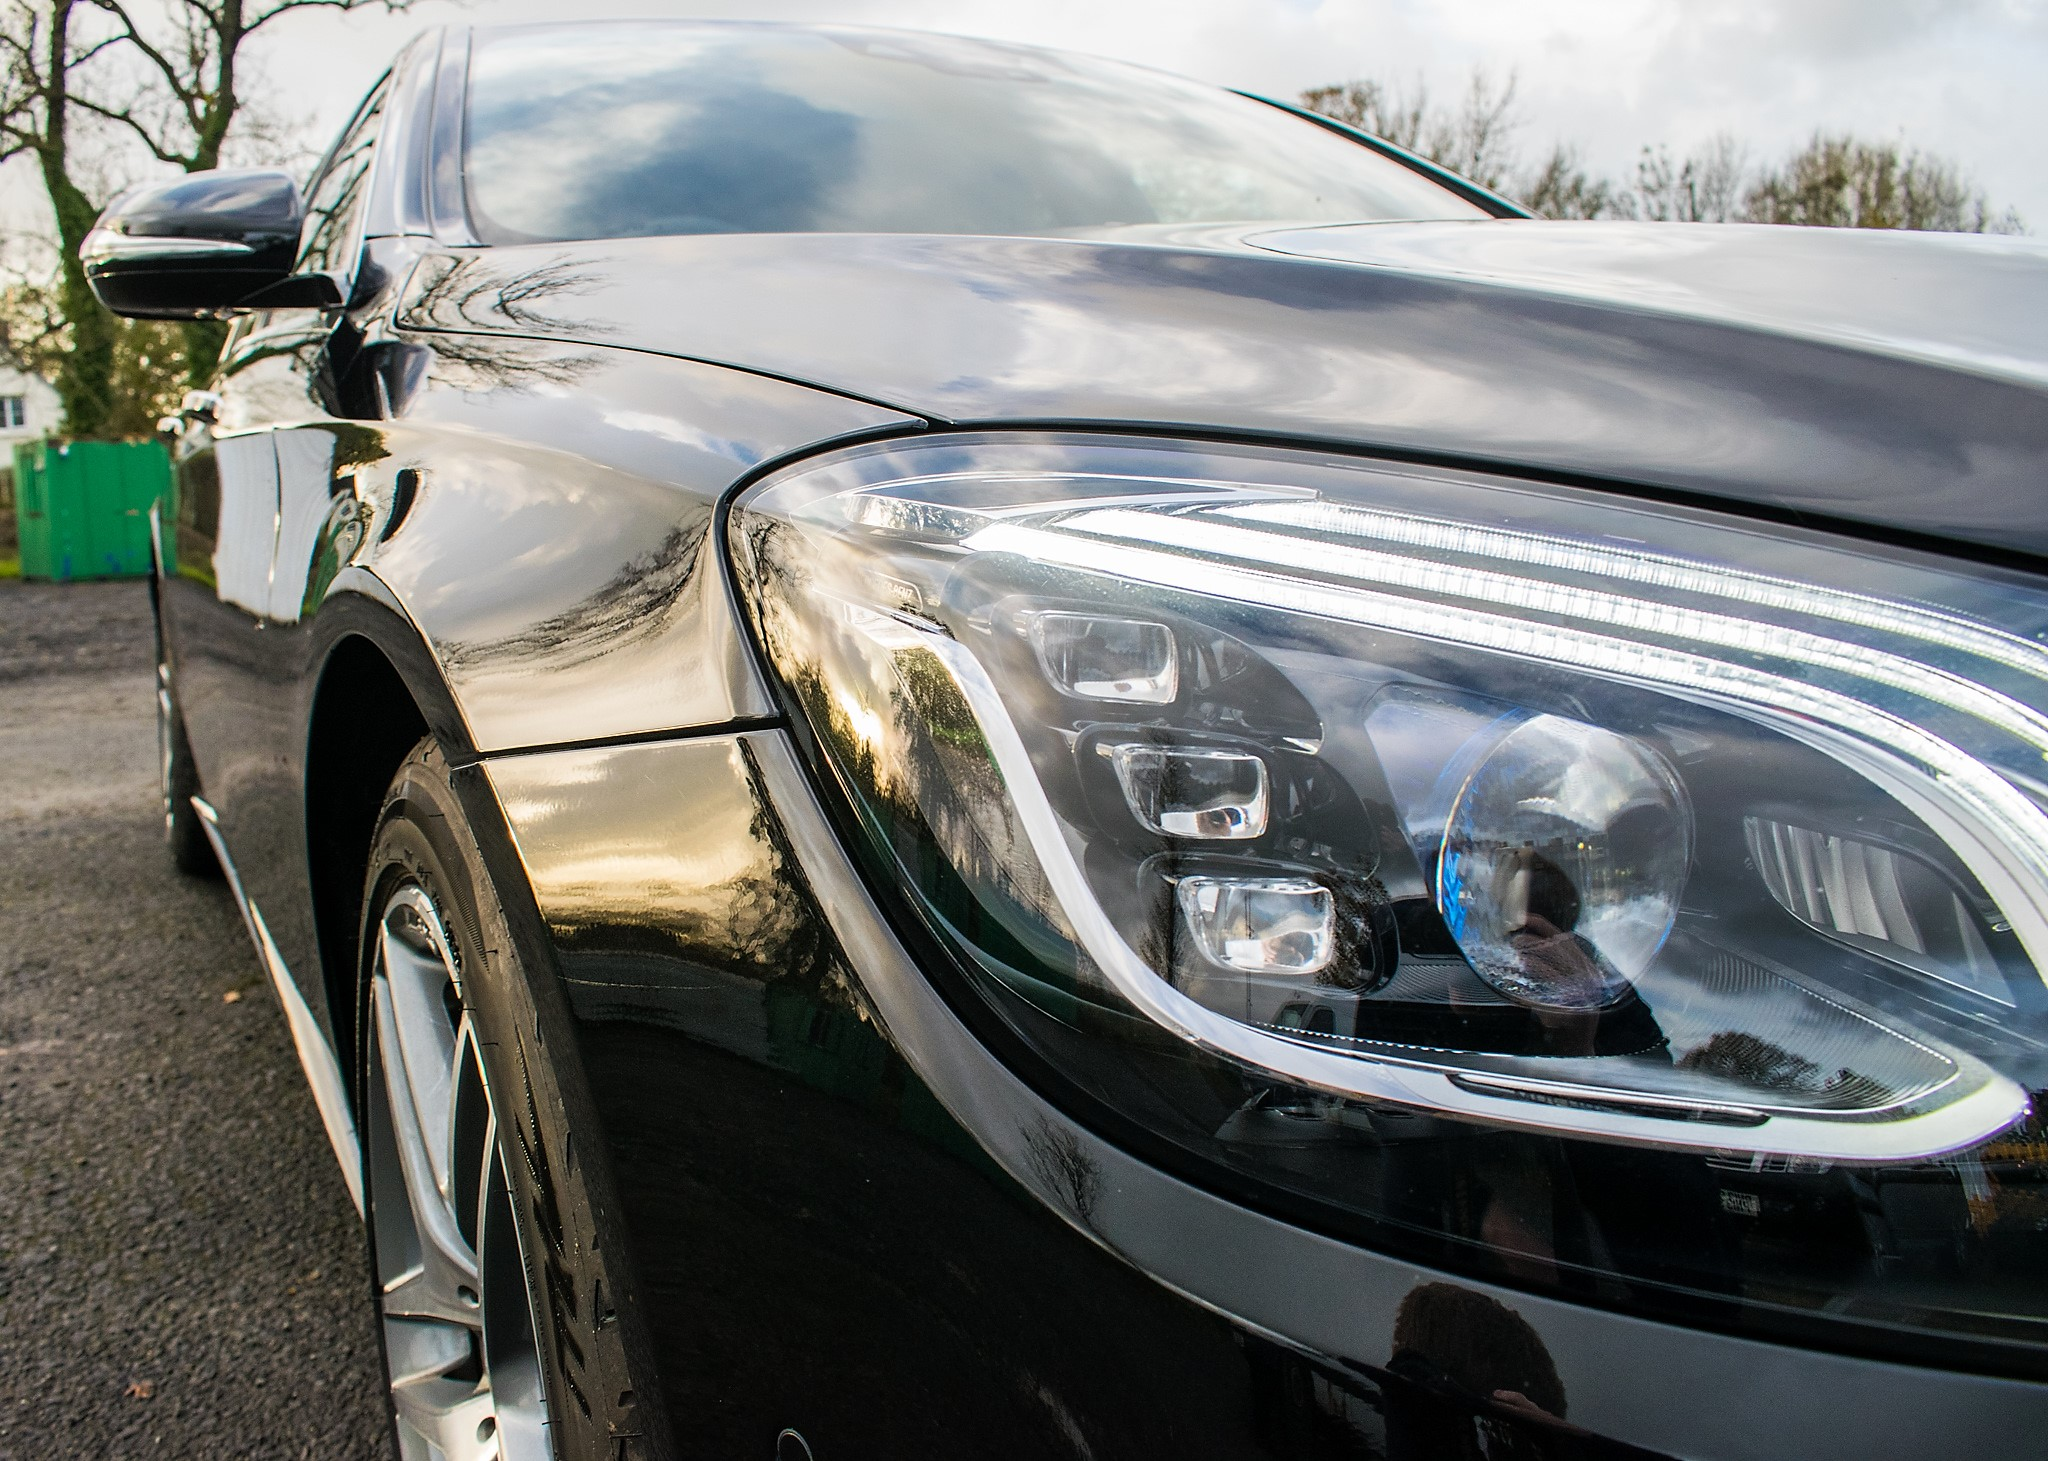 Mercedes Benz S450 L AMG Line Executive auto petrol 4 door saloon car Registration Number: FX68 - Image 11 of 33